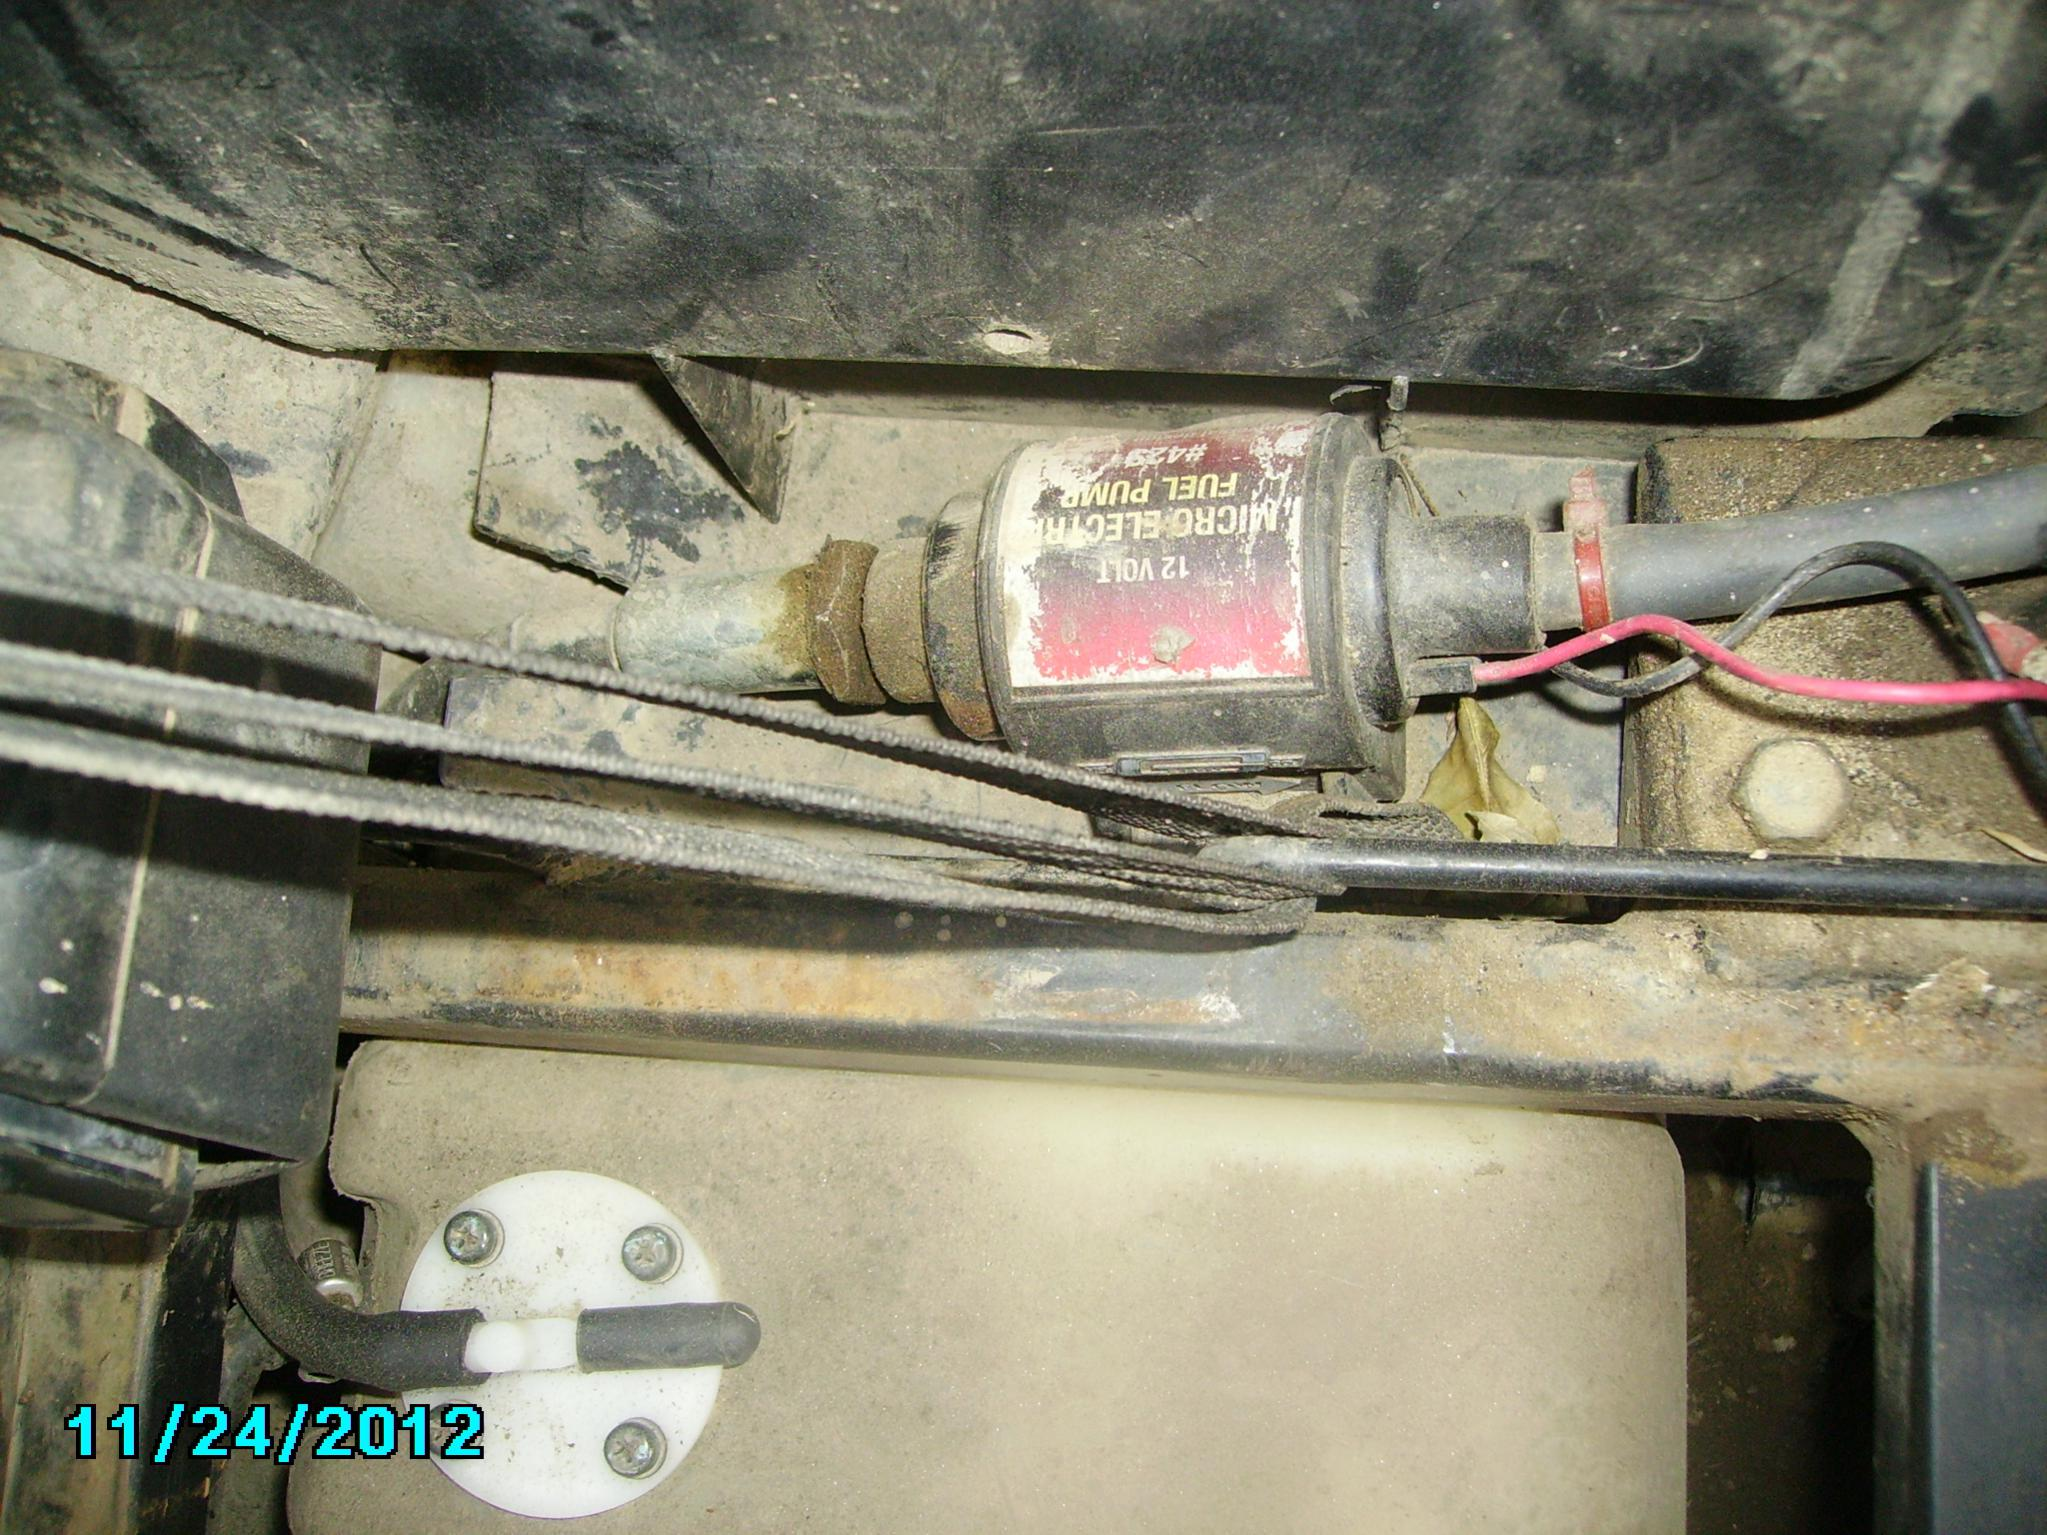 31417d1353766365-fuel-injected-660-kinda-rhino-fuel-pump-008 Yamaha Rhino Fuel Filter on new holland fuel filter, ktm fuel filter, kawasaki mule fuel filter, 2008 yamaha rhino 700 air filter, john deere fuel filter,